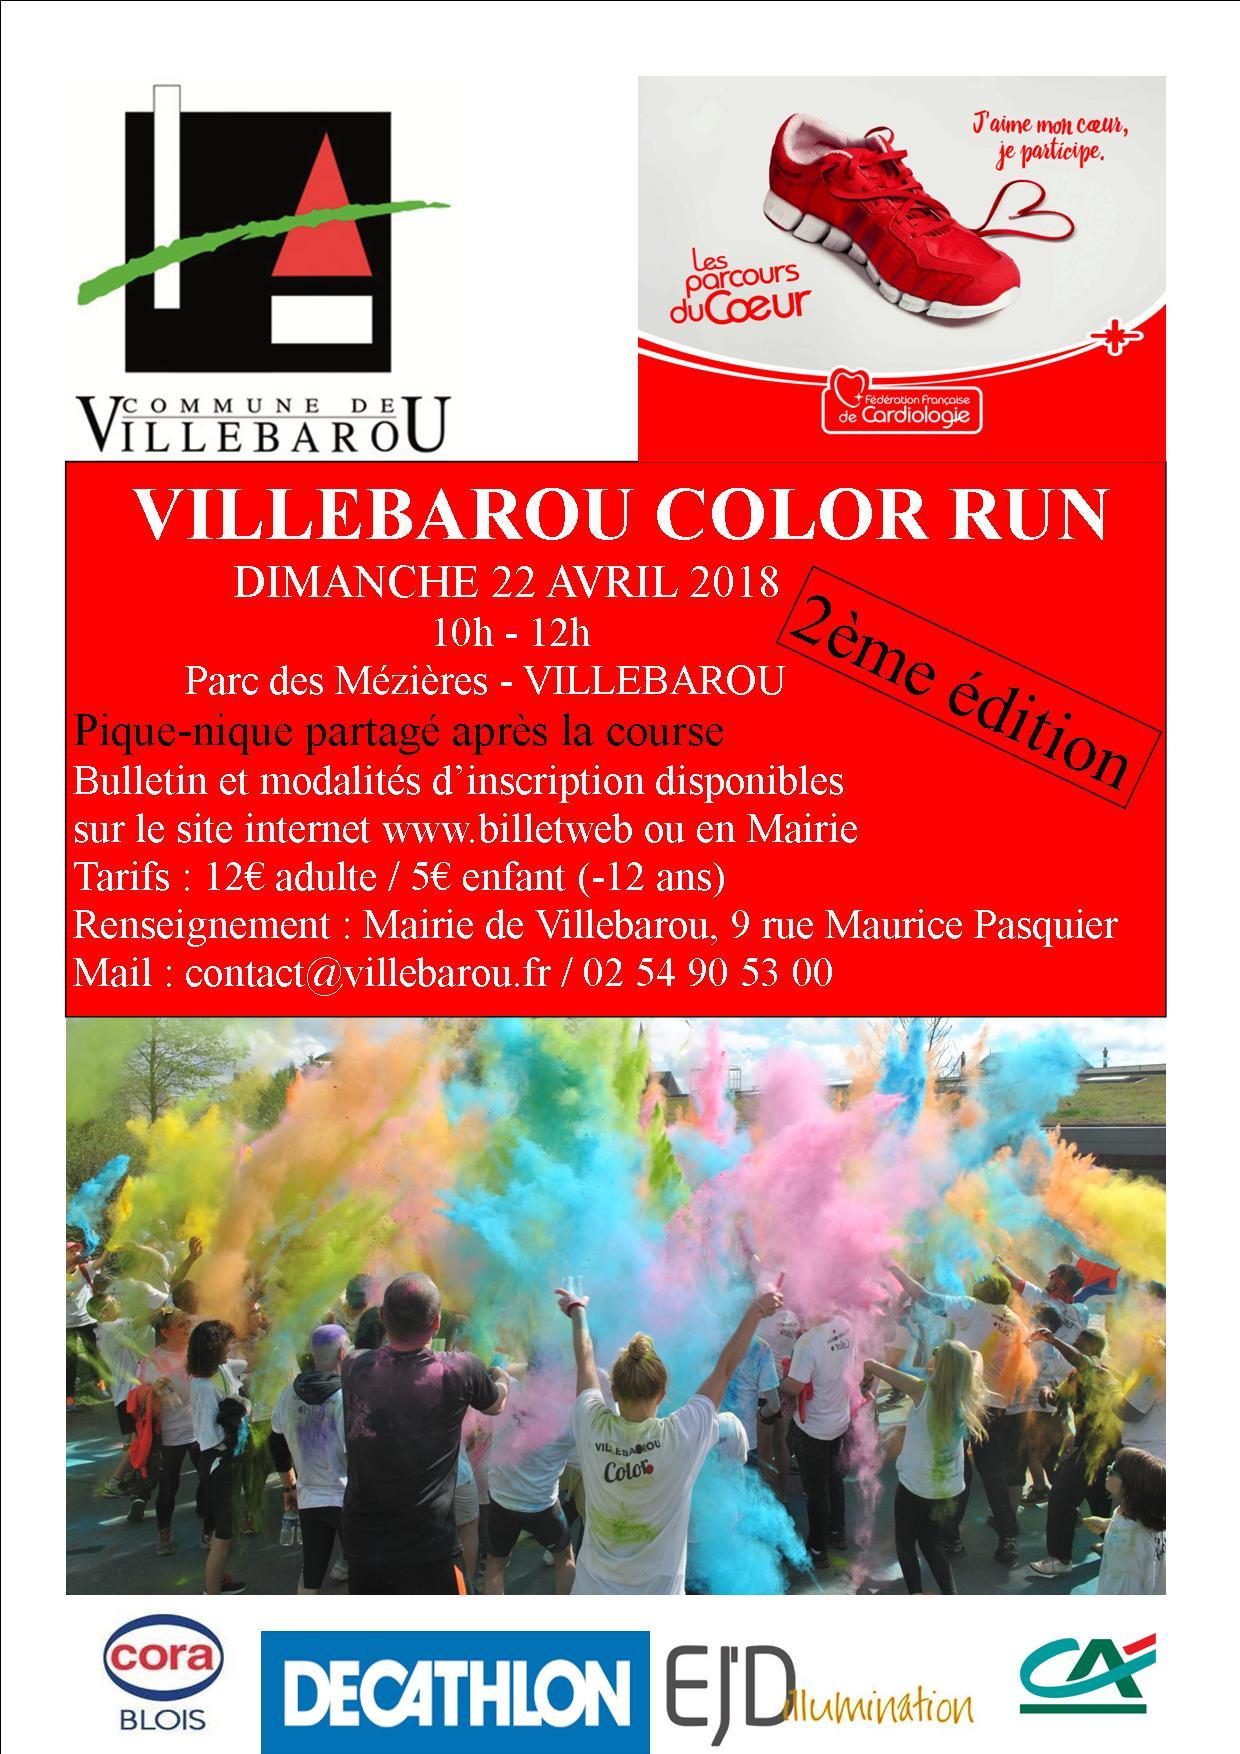 Villebarou Color